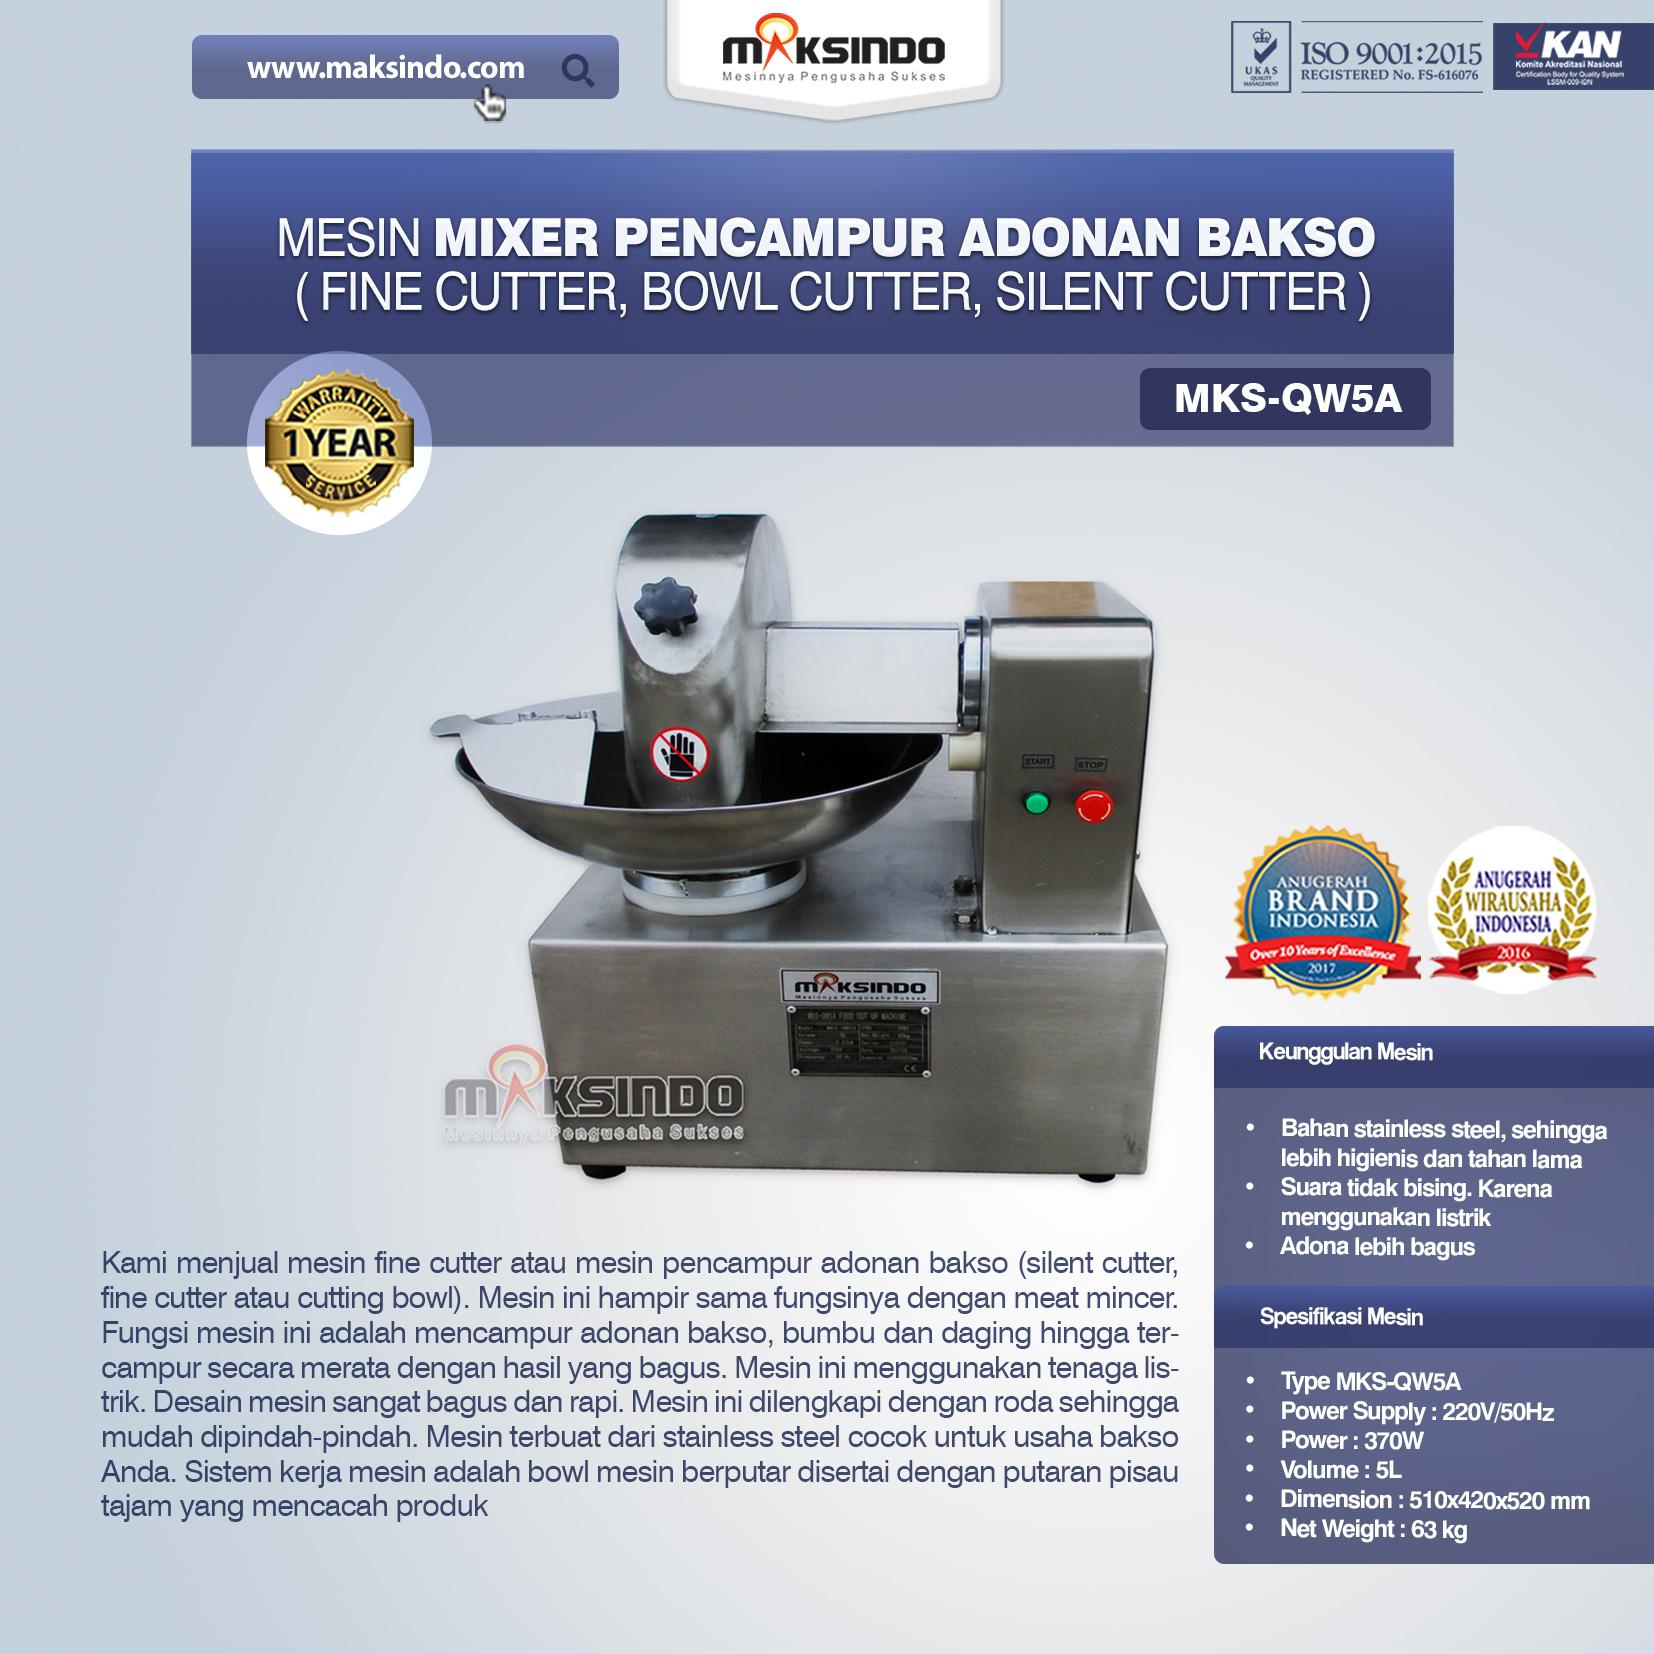 Jual Mesin Adonan Bakso (Cut Bowl / Silent Cutter / Fine Cutter) di Solo